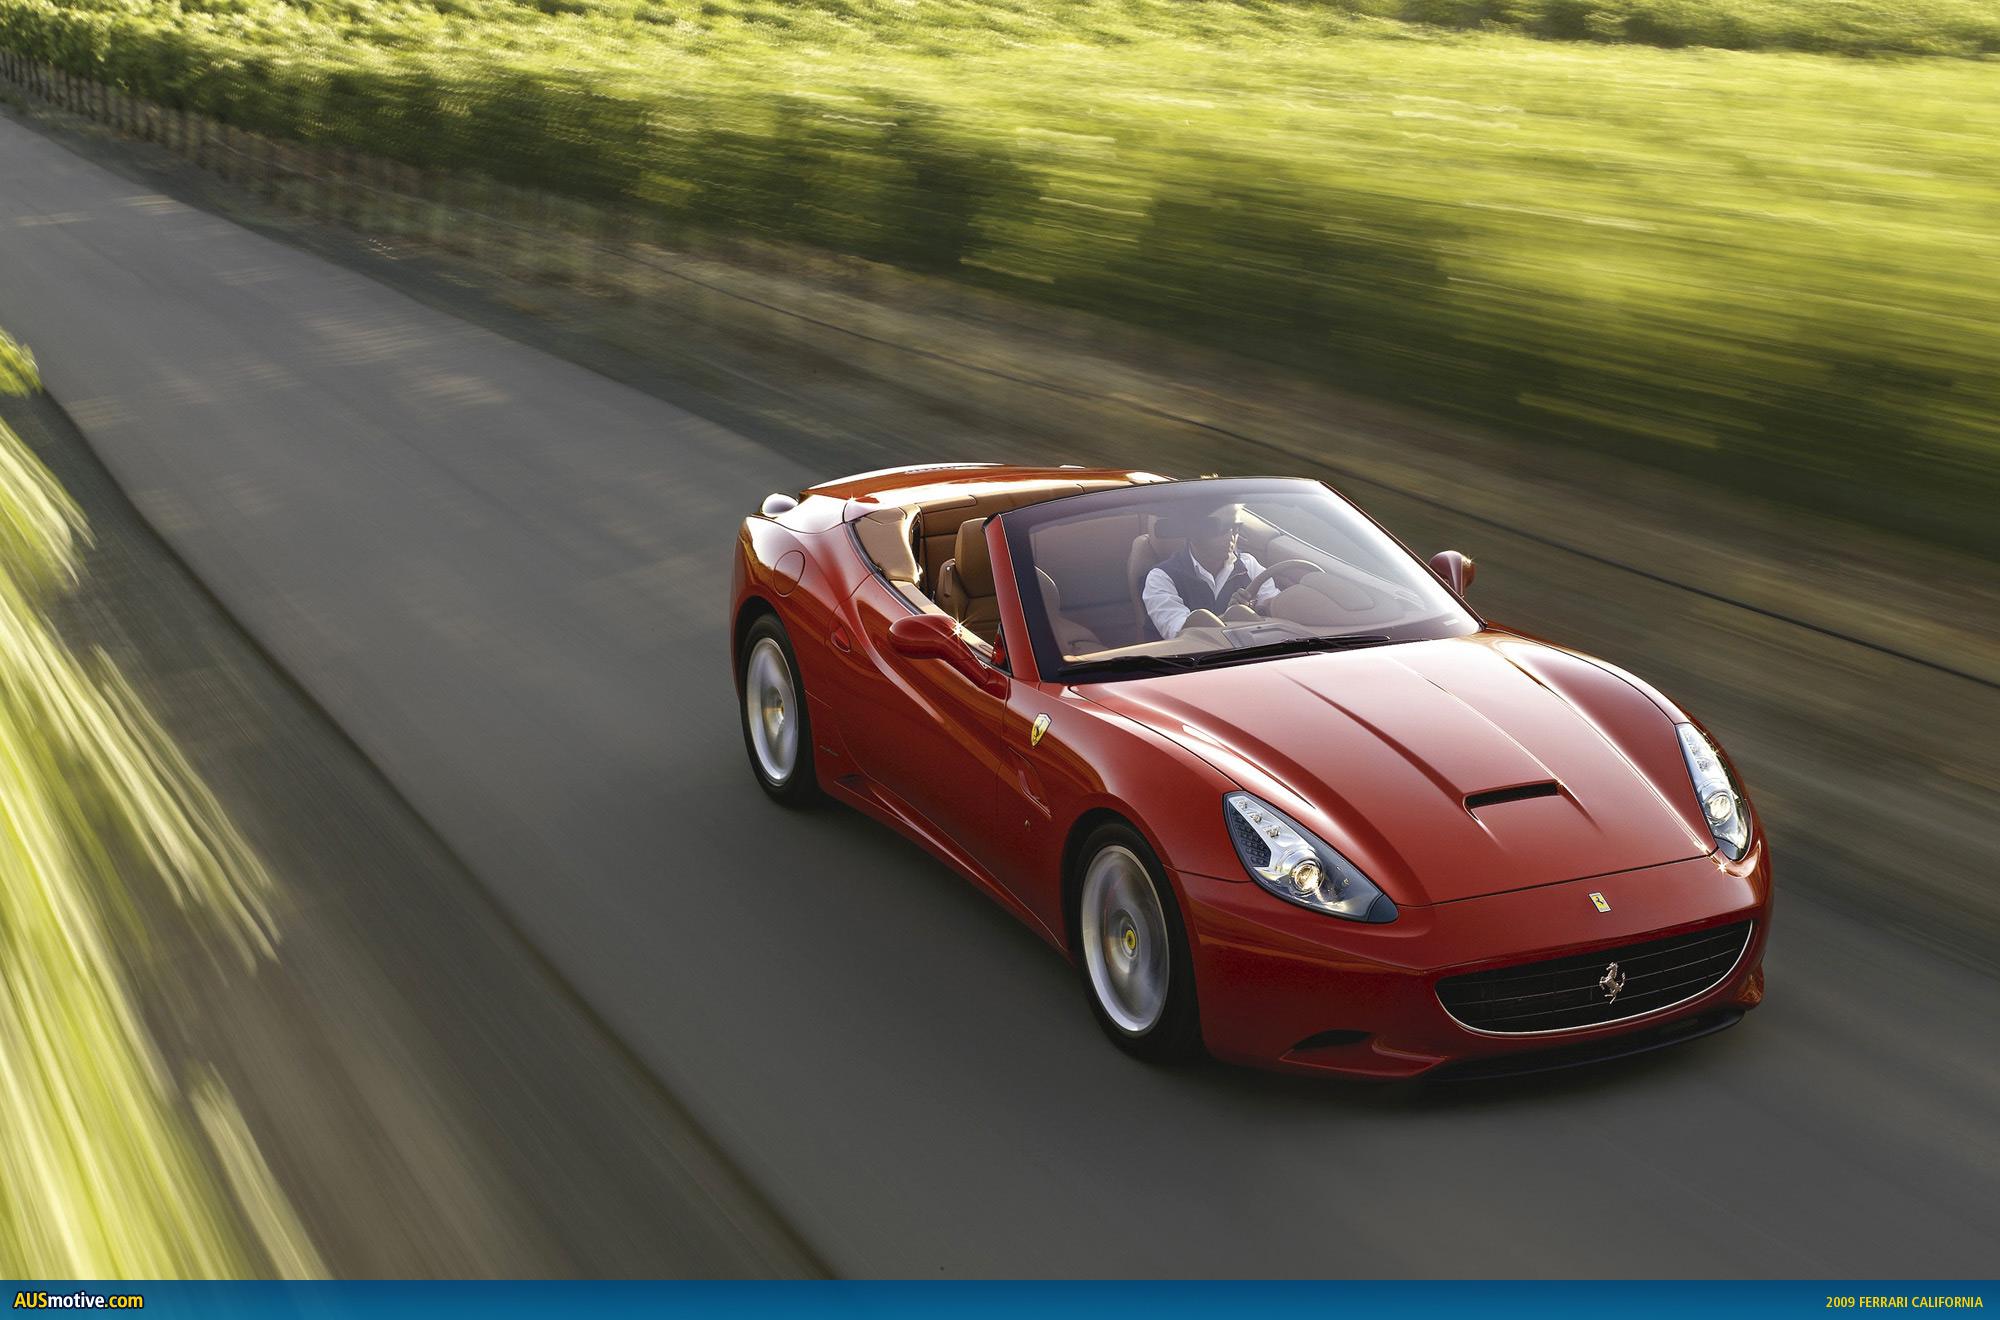 the Ferrari California has